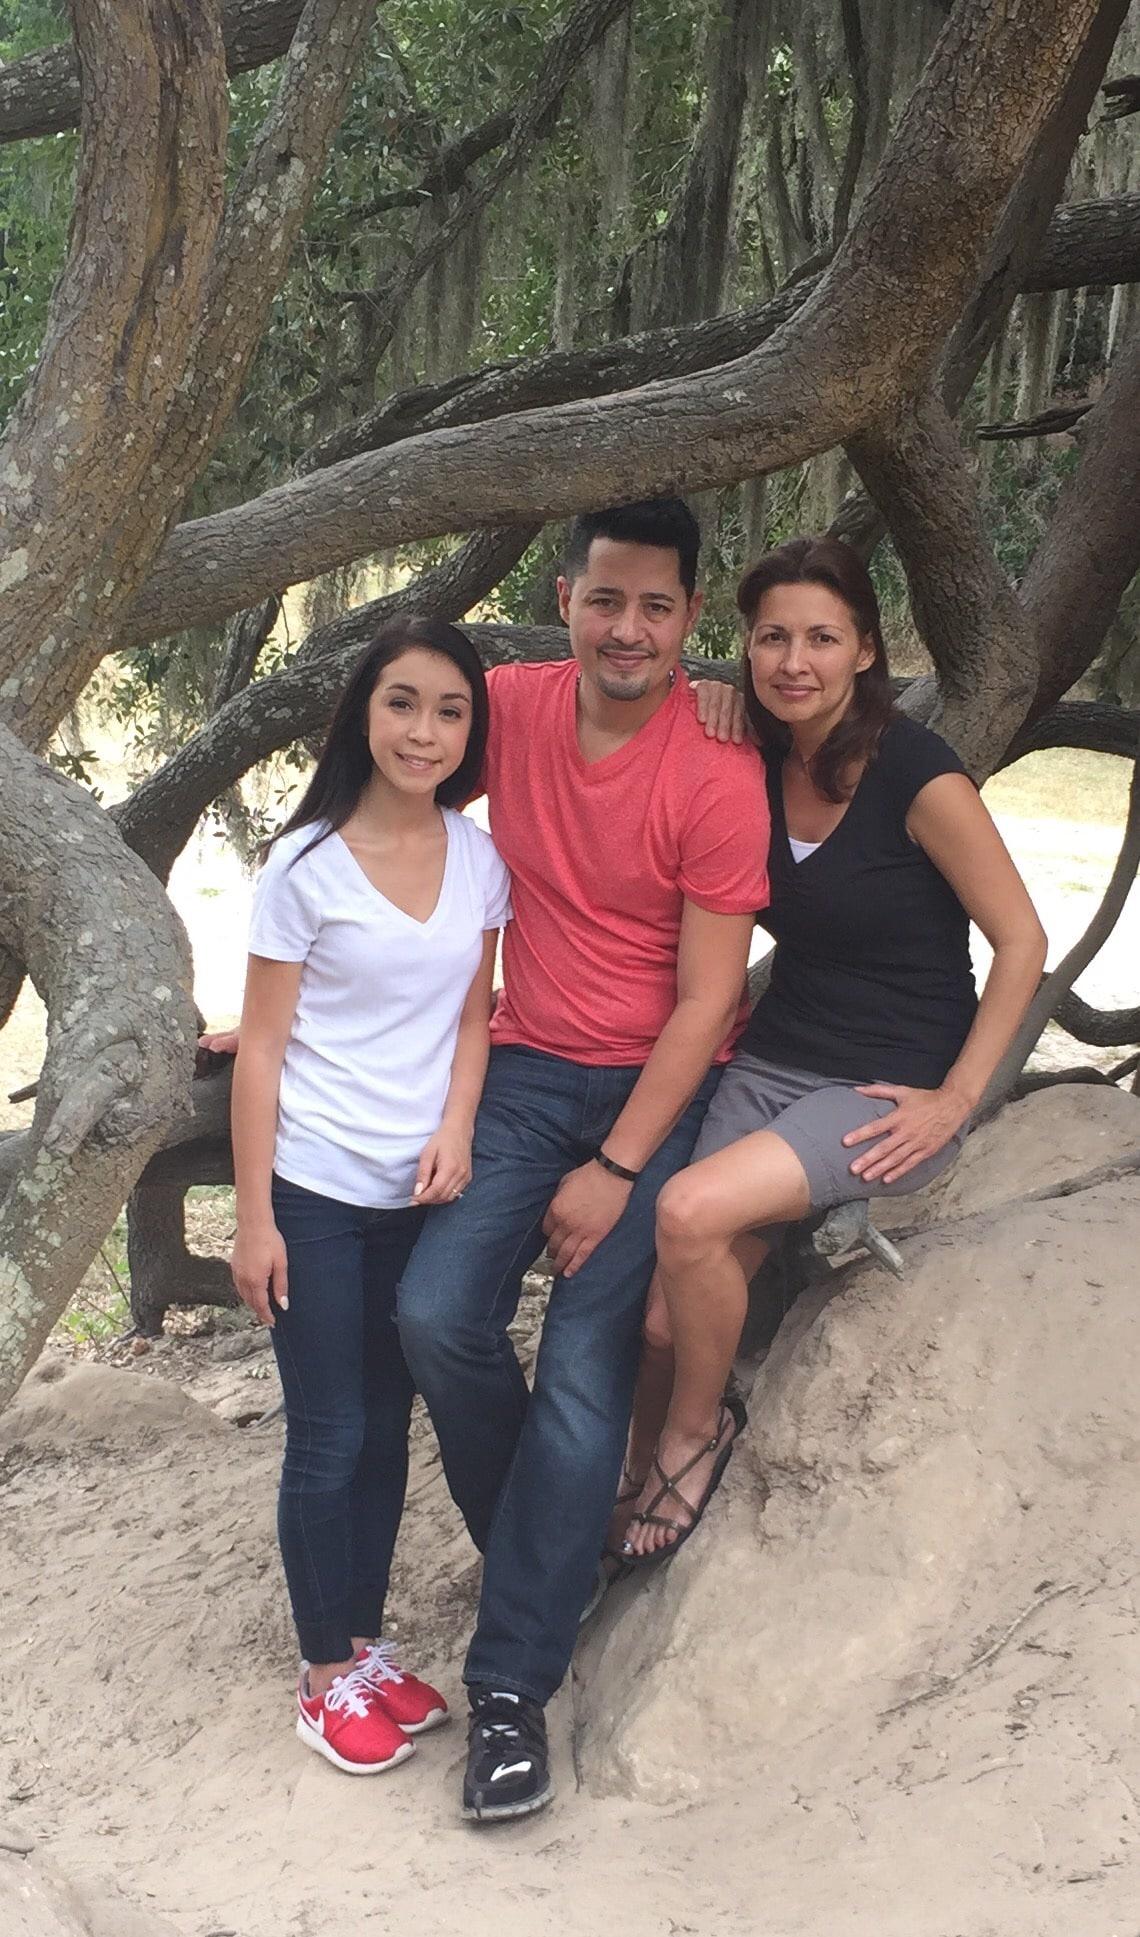 Adam, Cathy & Kat (Niece) Garcia from Utuado